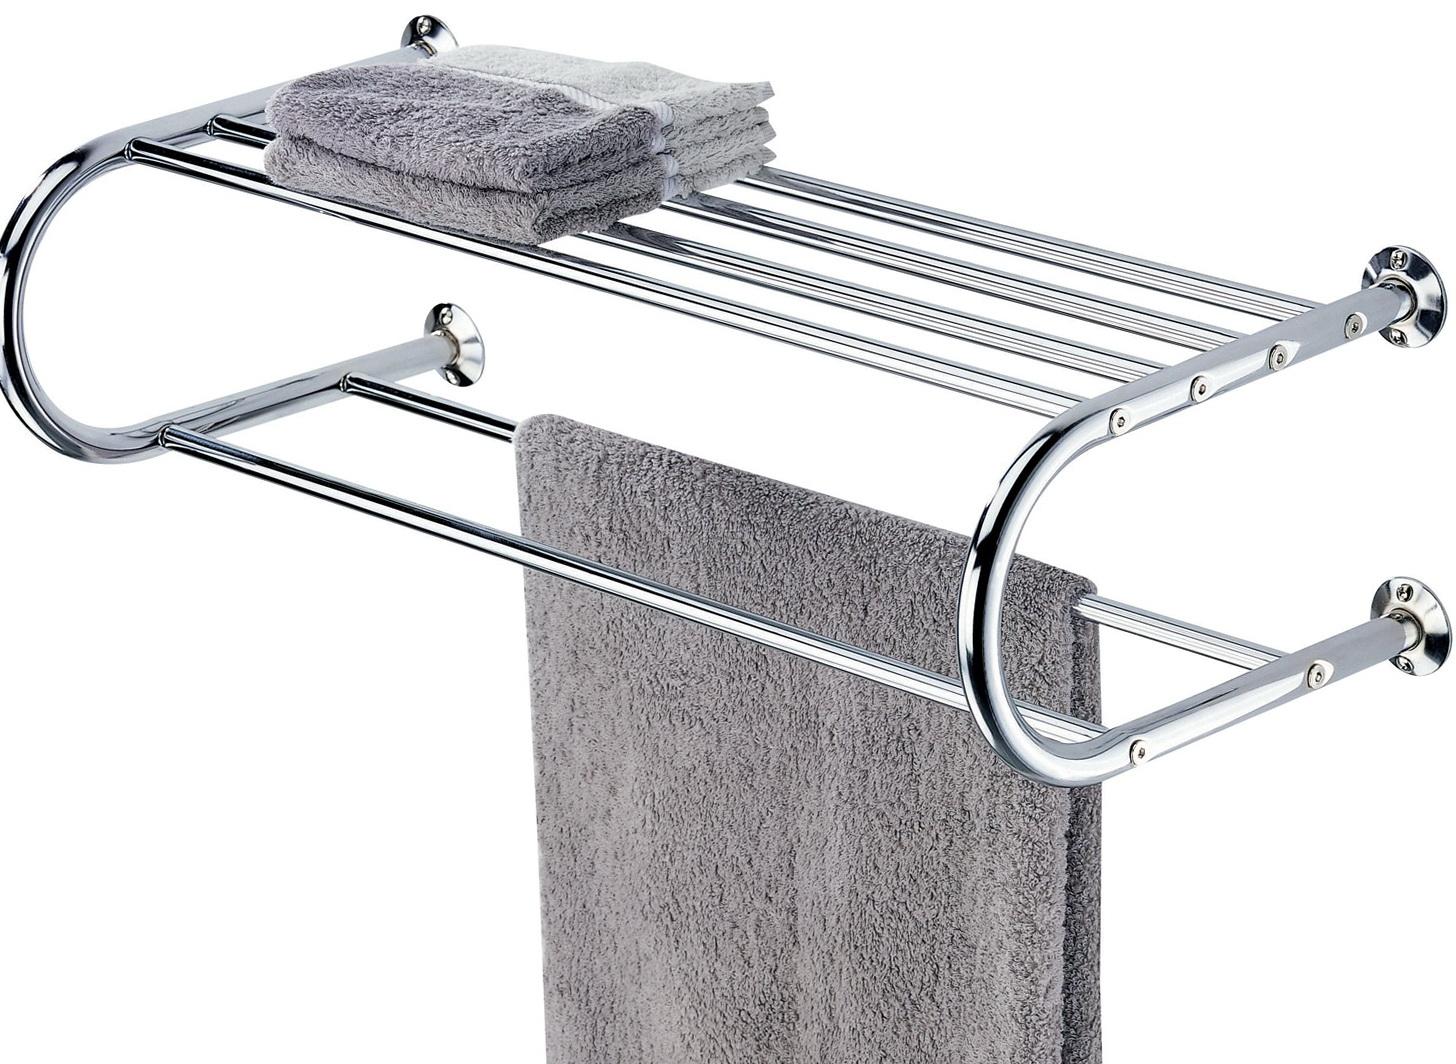 Bathroom Towel Racks With Shelves